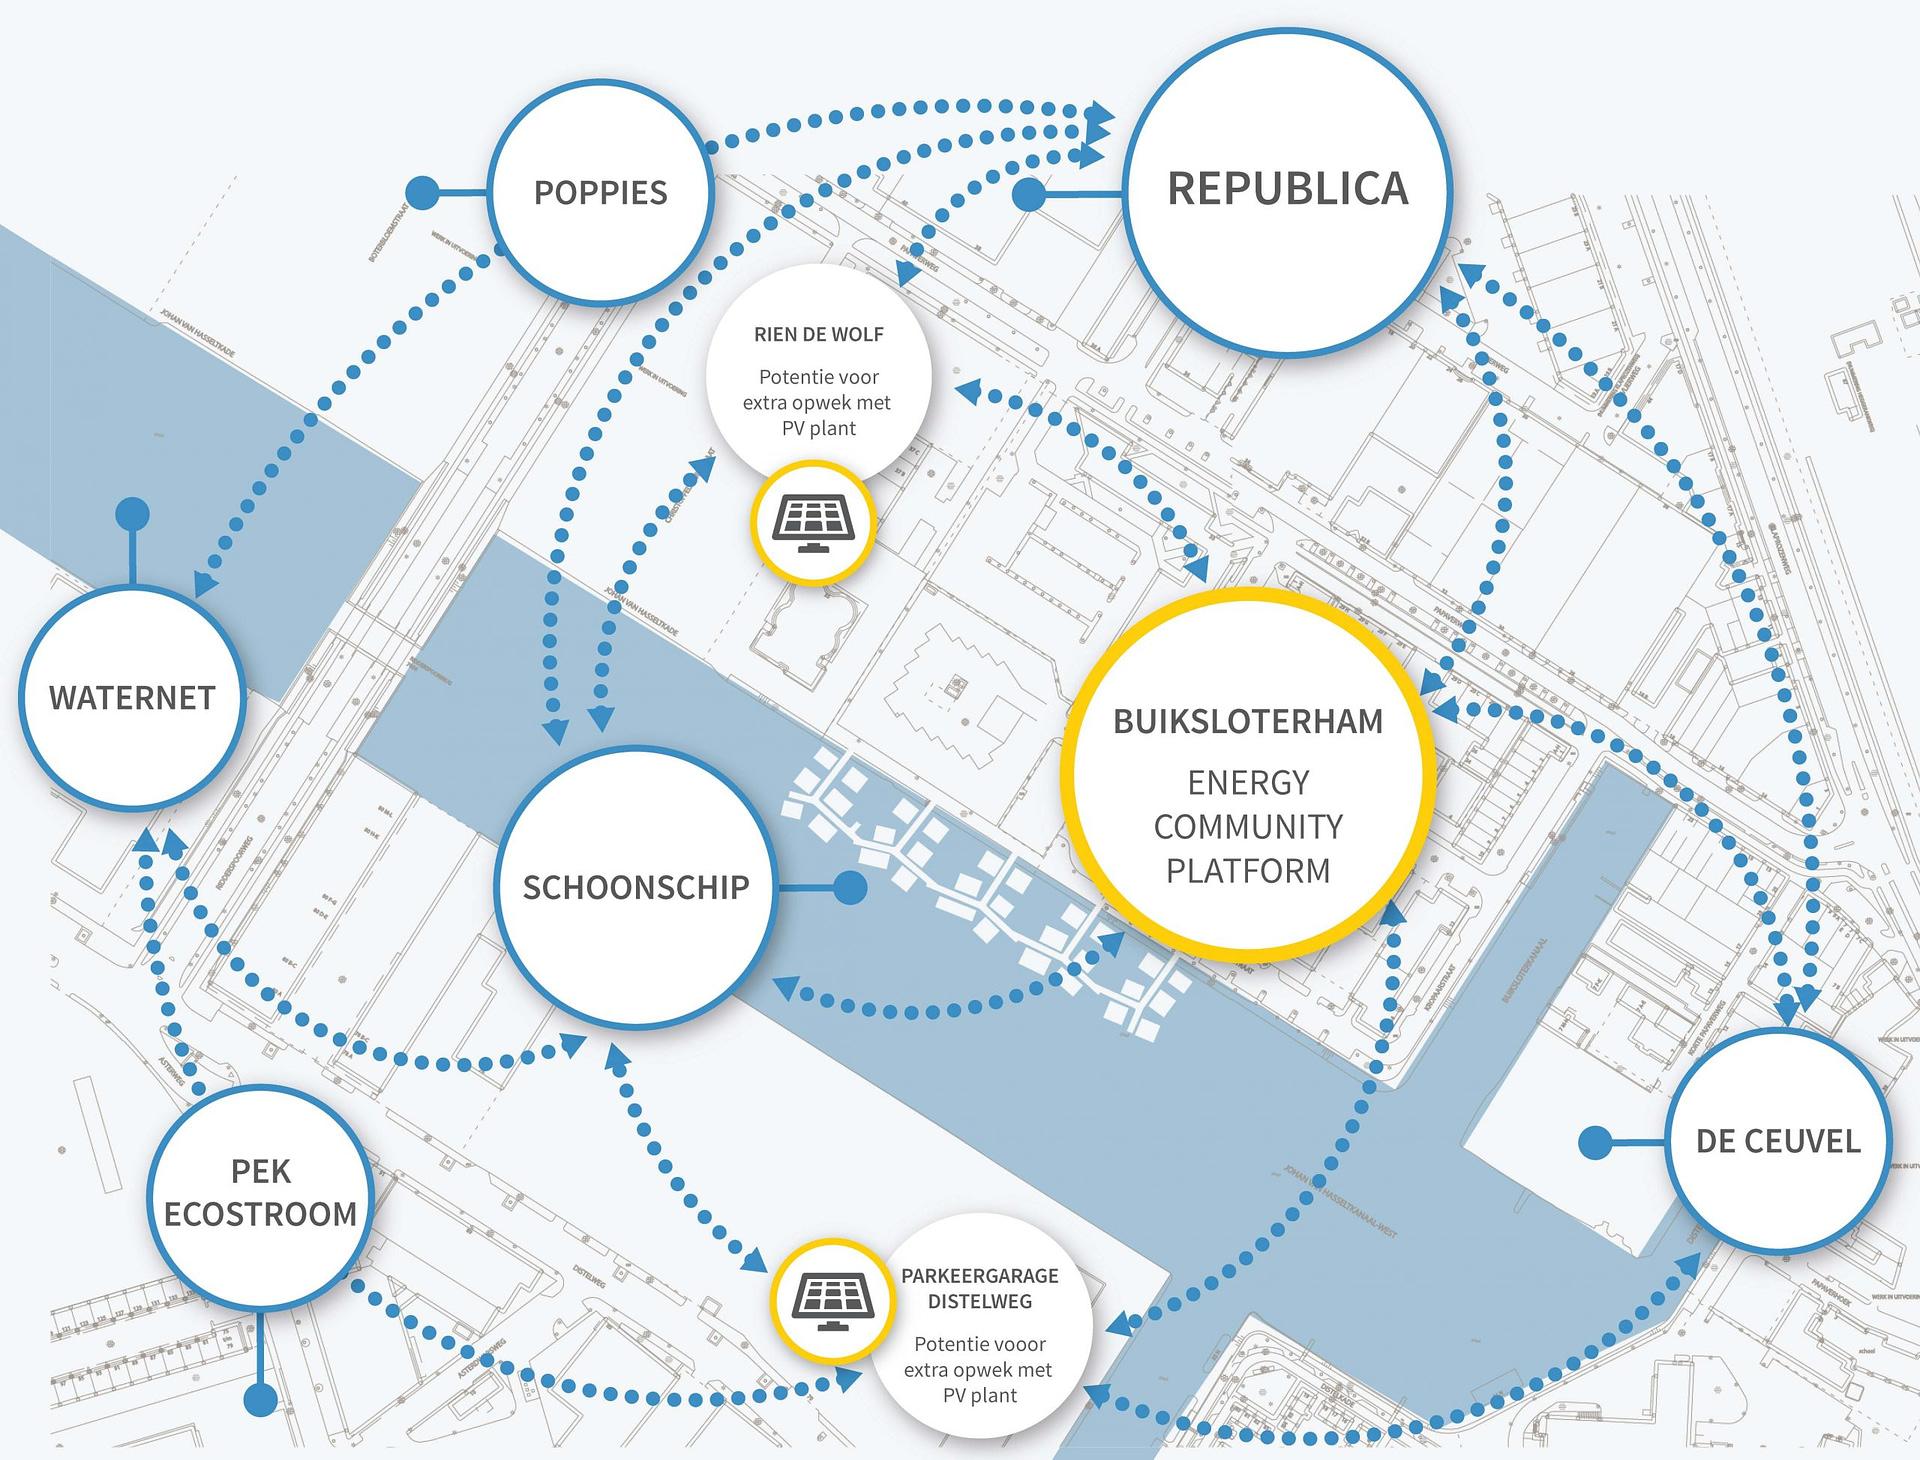 Smart energy grids and communities across Buiksloterham